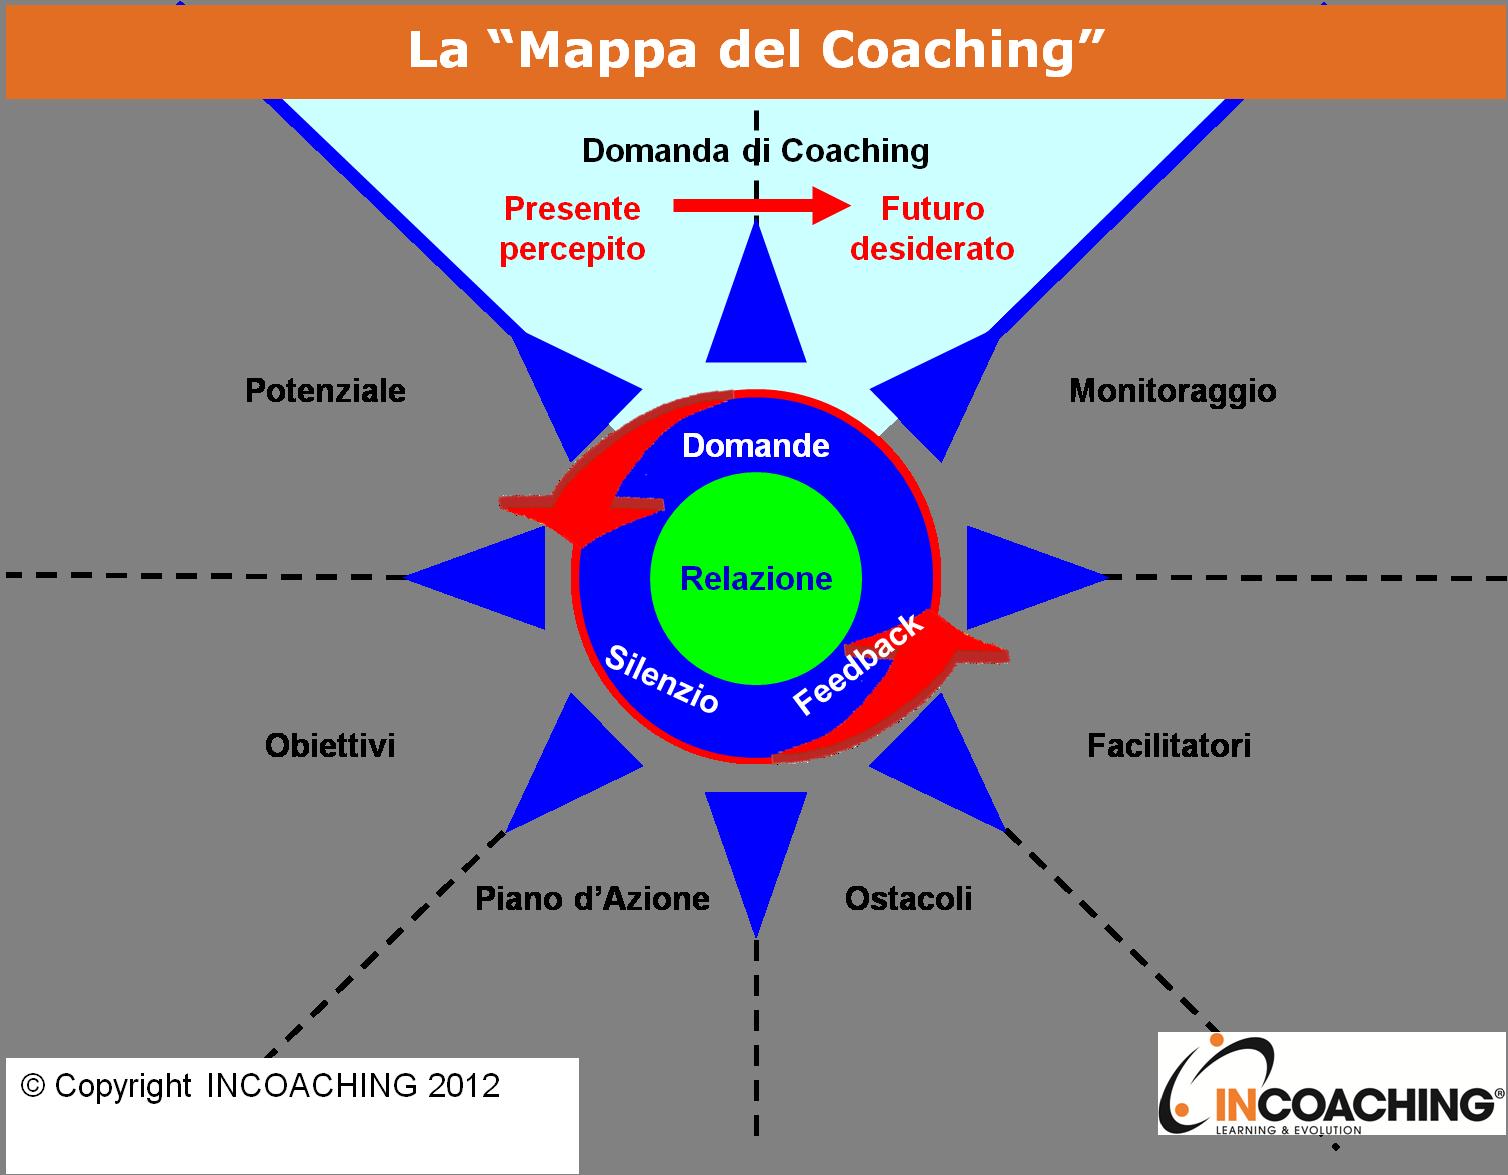 Mappa del Coaching